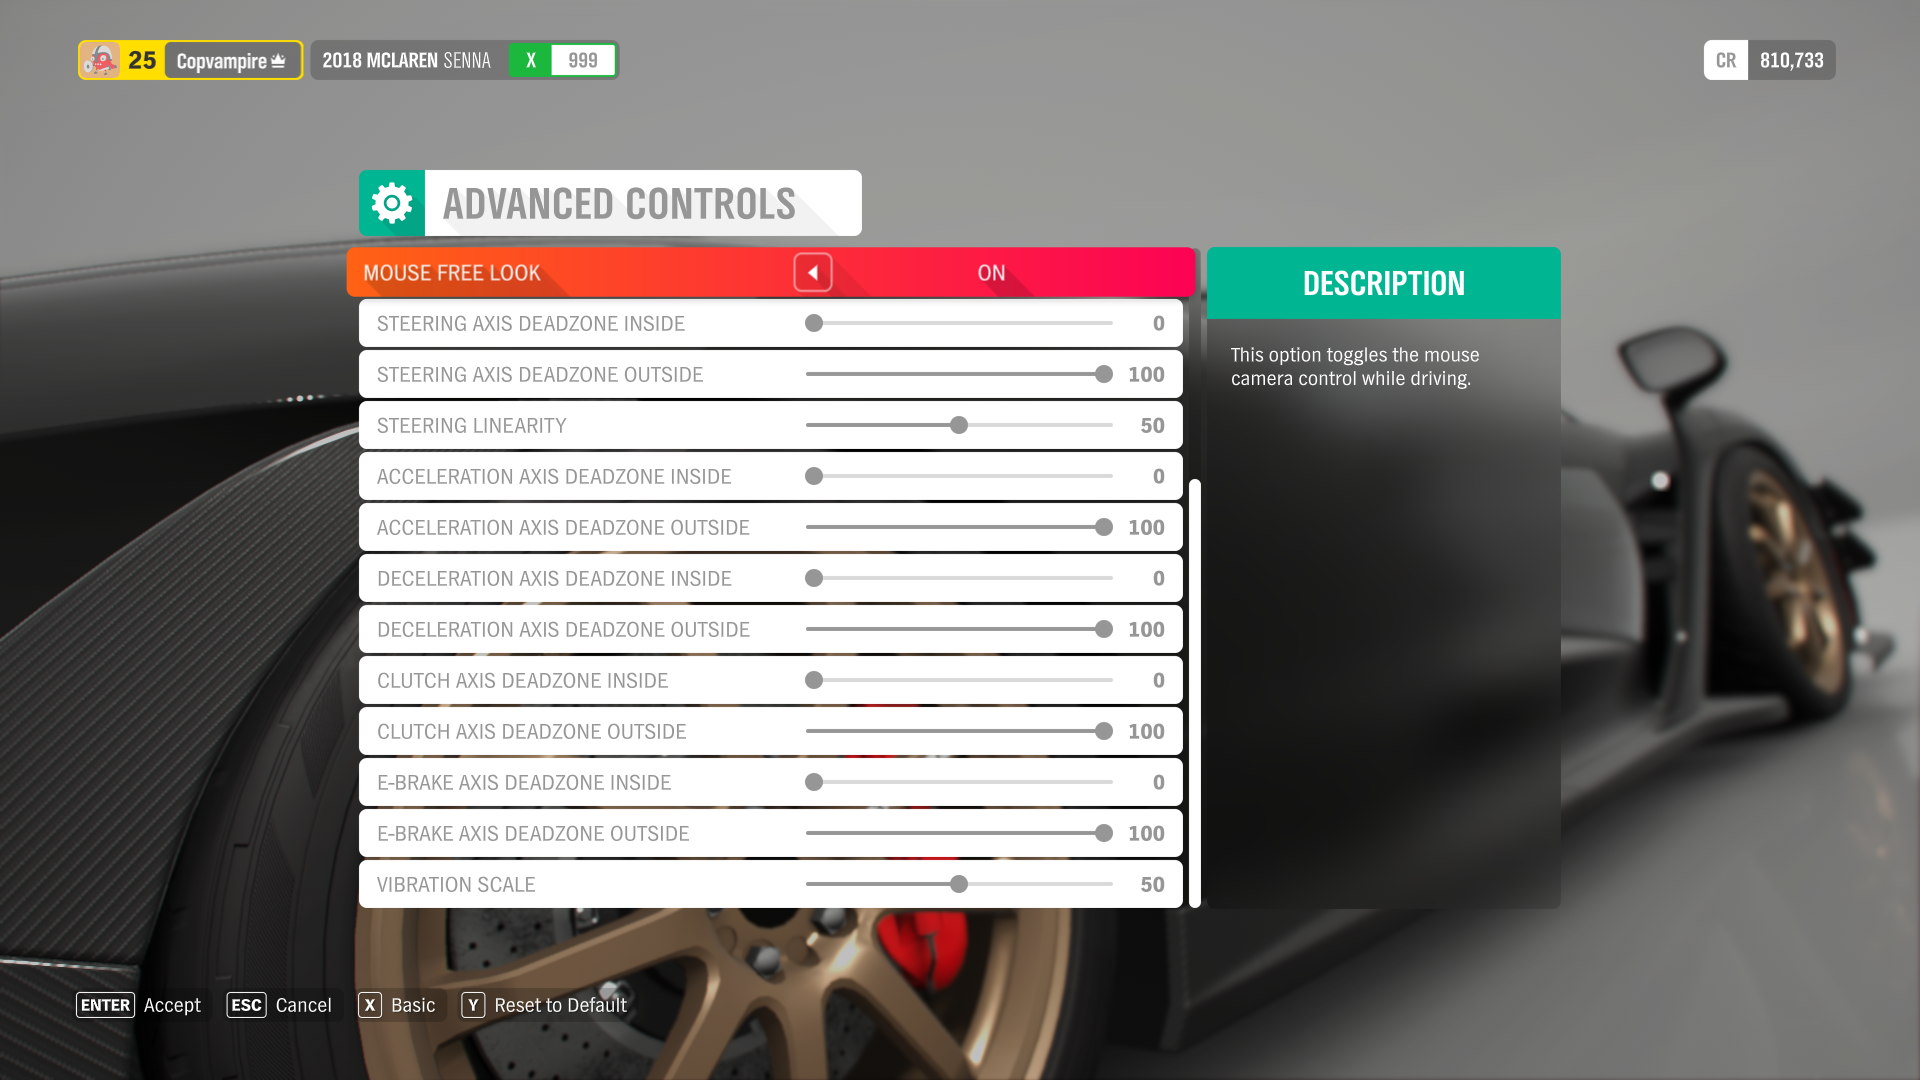 Game profile - Forza Horizon 4 - Wooting Knowledge Base